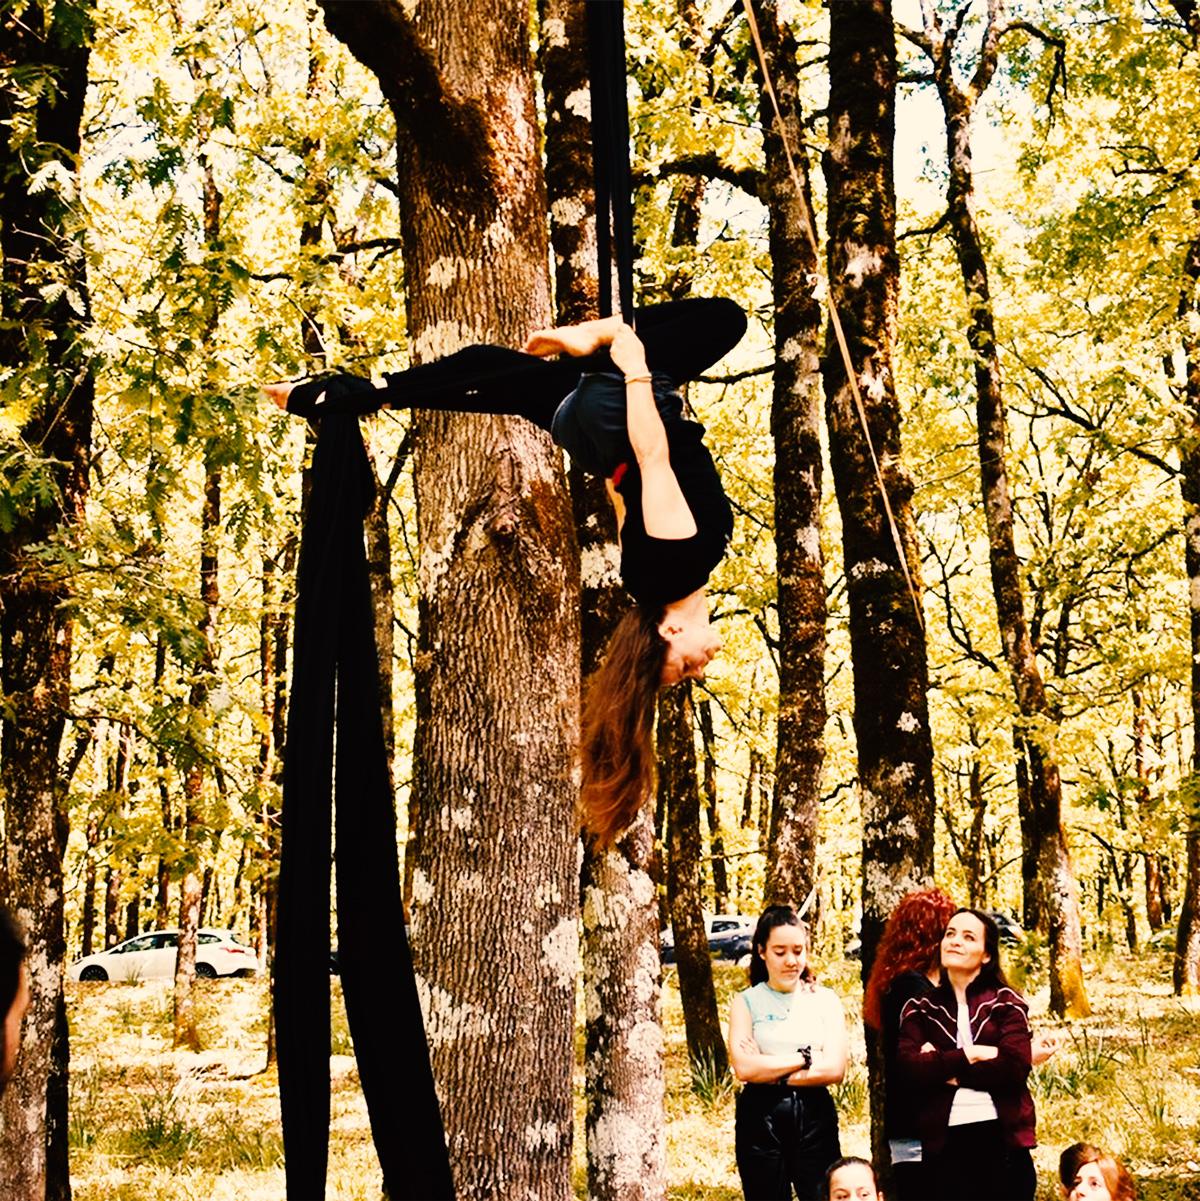 xorokinisi-aerial-silks-1